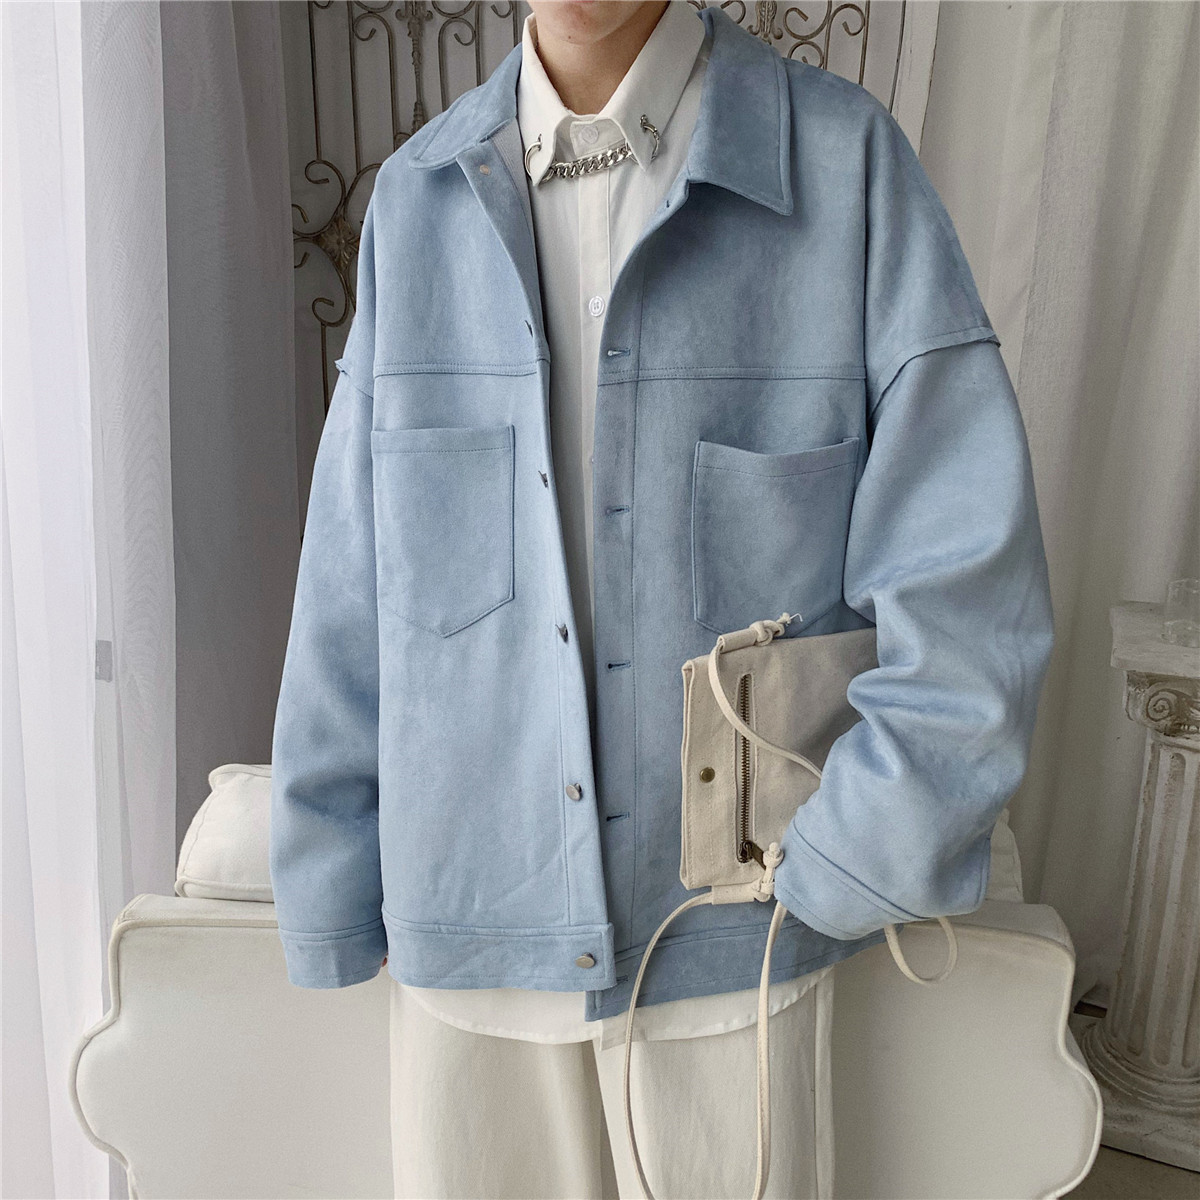 2020 Men's Tide Streetwear Bomber Jacket Leisure Fashion Coats Loose Black/Apricot/blue/green High-quality Outerwear Size M-2XL